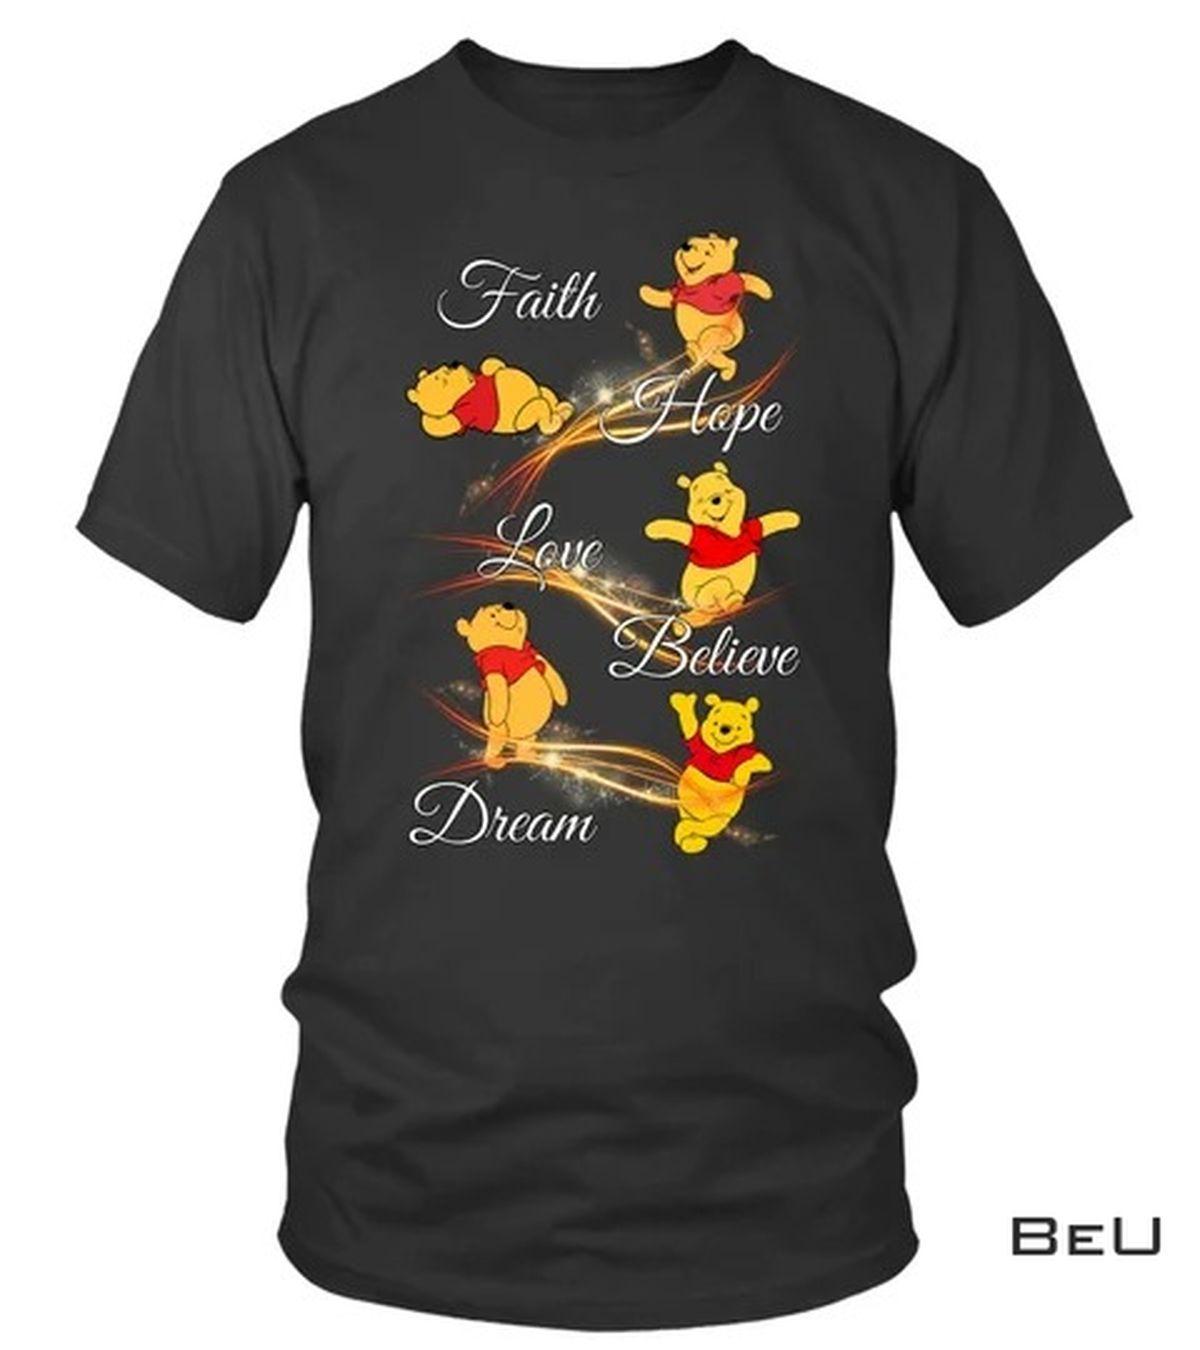 Winnie The Pooh Pooh Faith Hope Love Believe Dream Shirt, hoodie, tank top